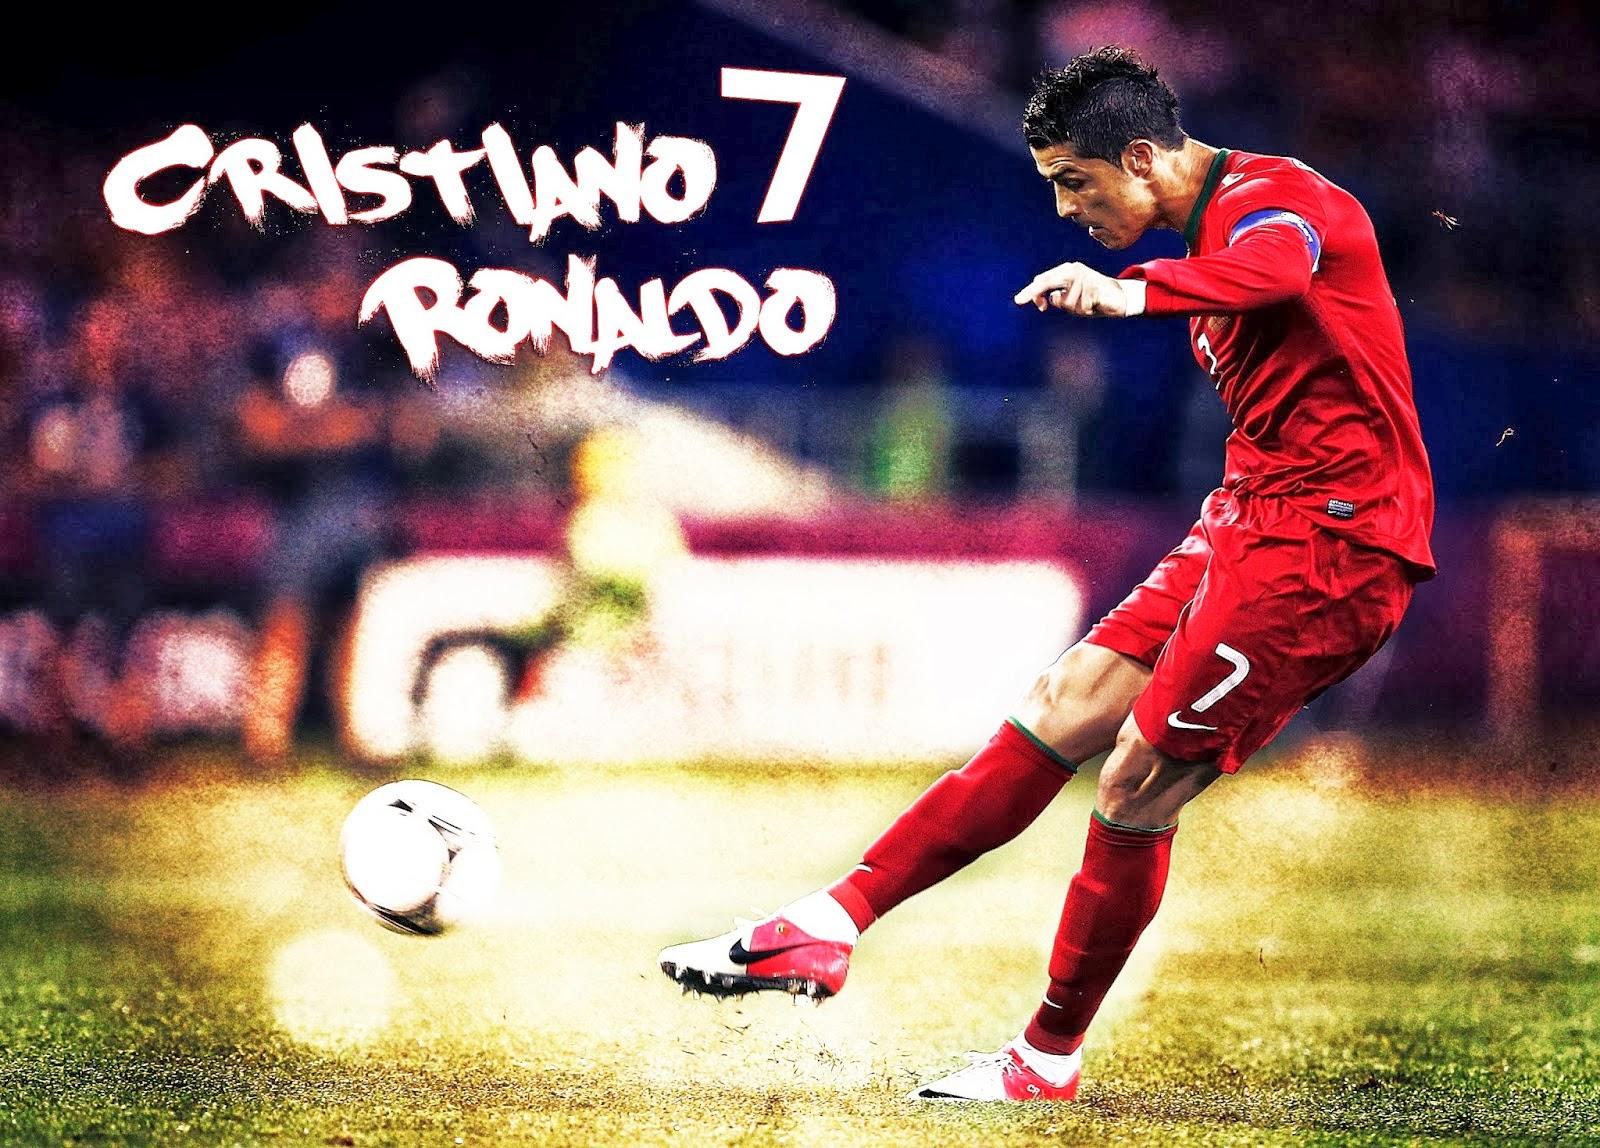 Cristiano Ronaldo Hd Wallpaper Images Pics Hd Wallpapers Blog